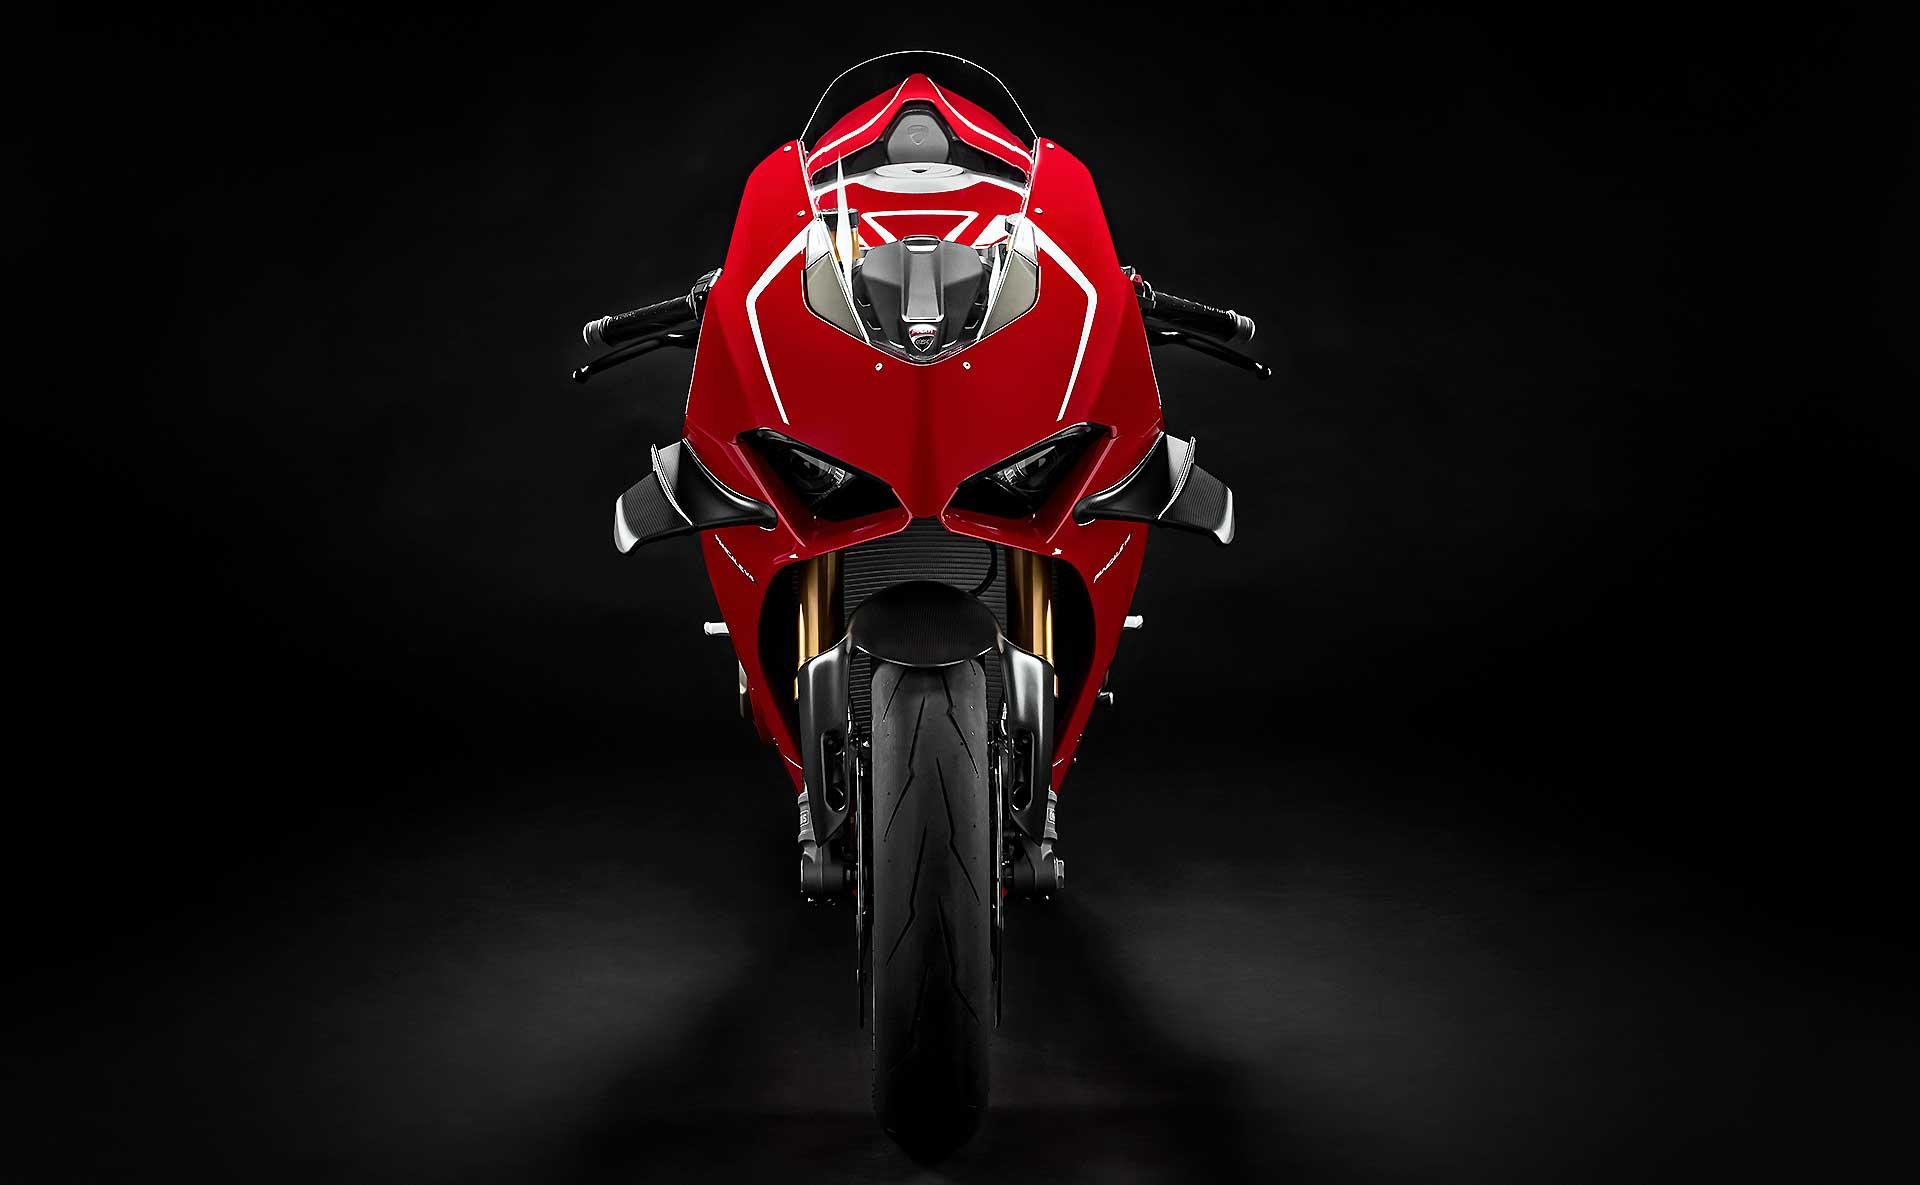 Ducati-Panigale-V4R-004.jpg